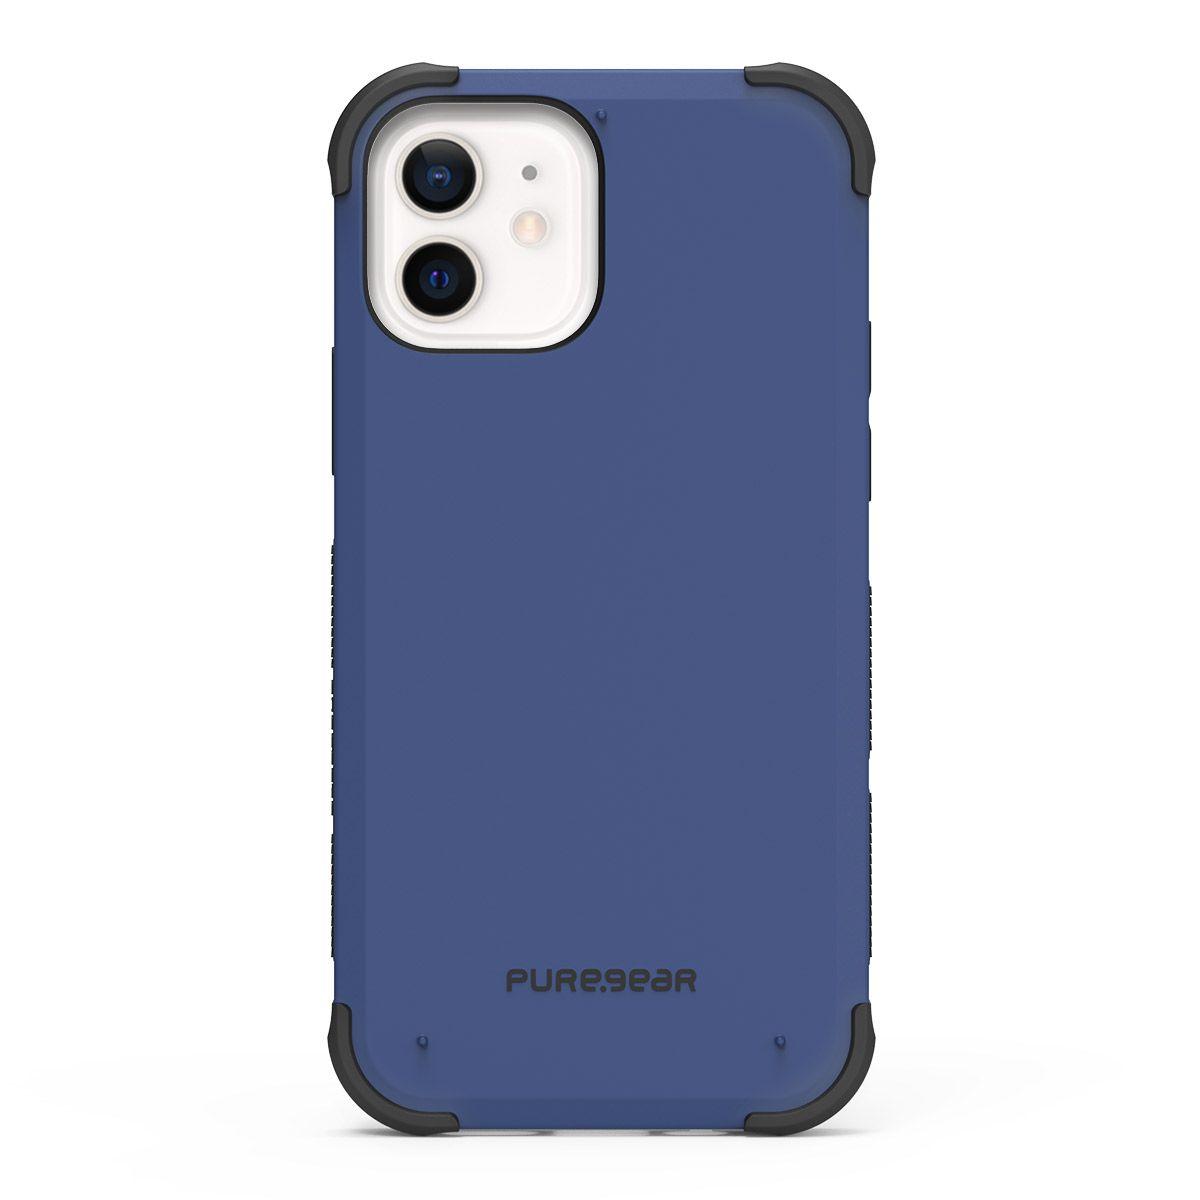 Apple iPhone 12 mini Dualtek - Pacific Coast